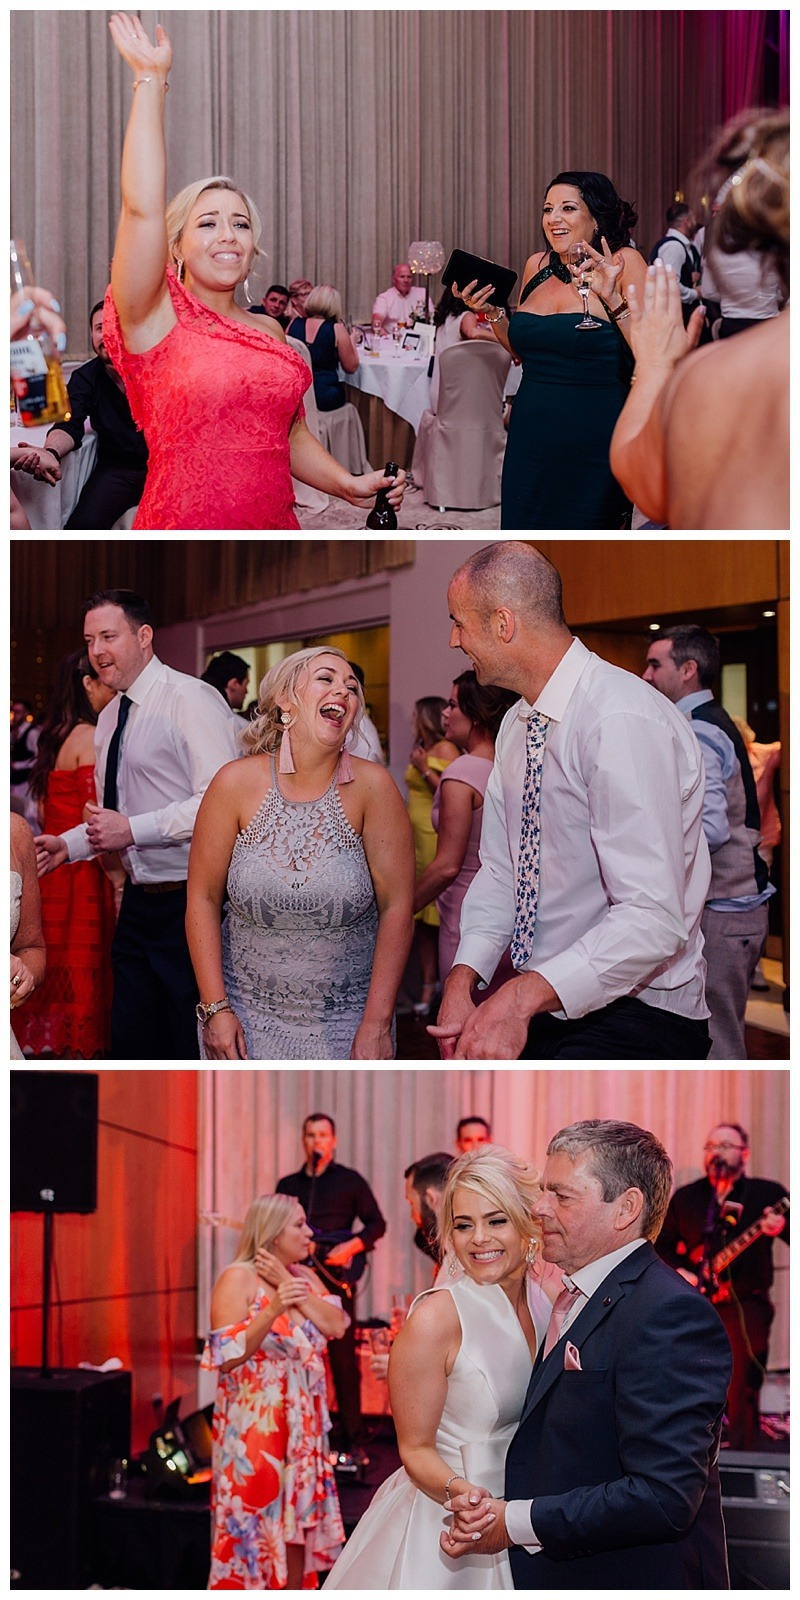 fine-art-wedding-photographer-cork-ireland